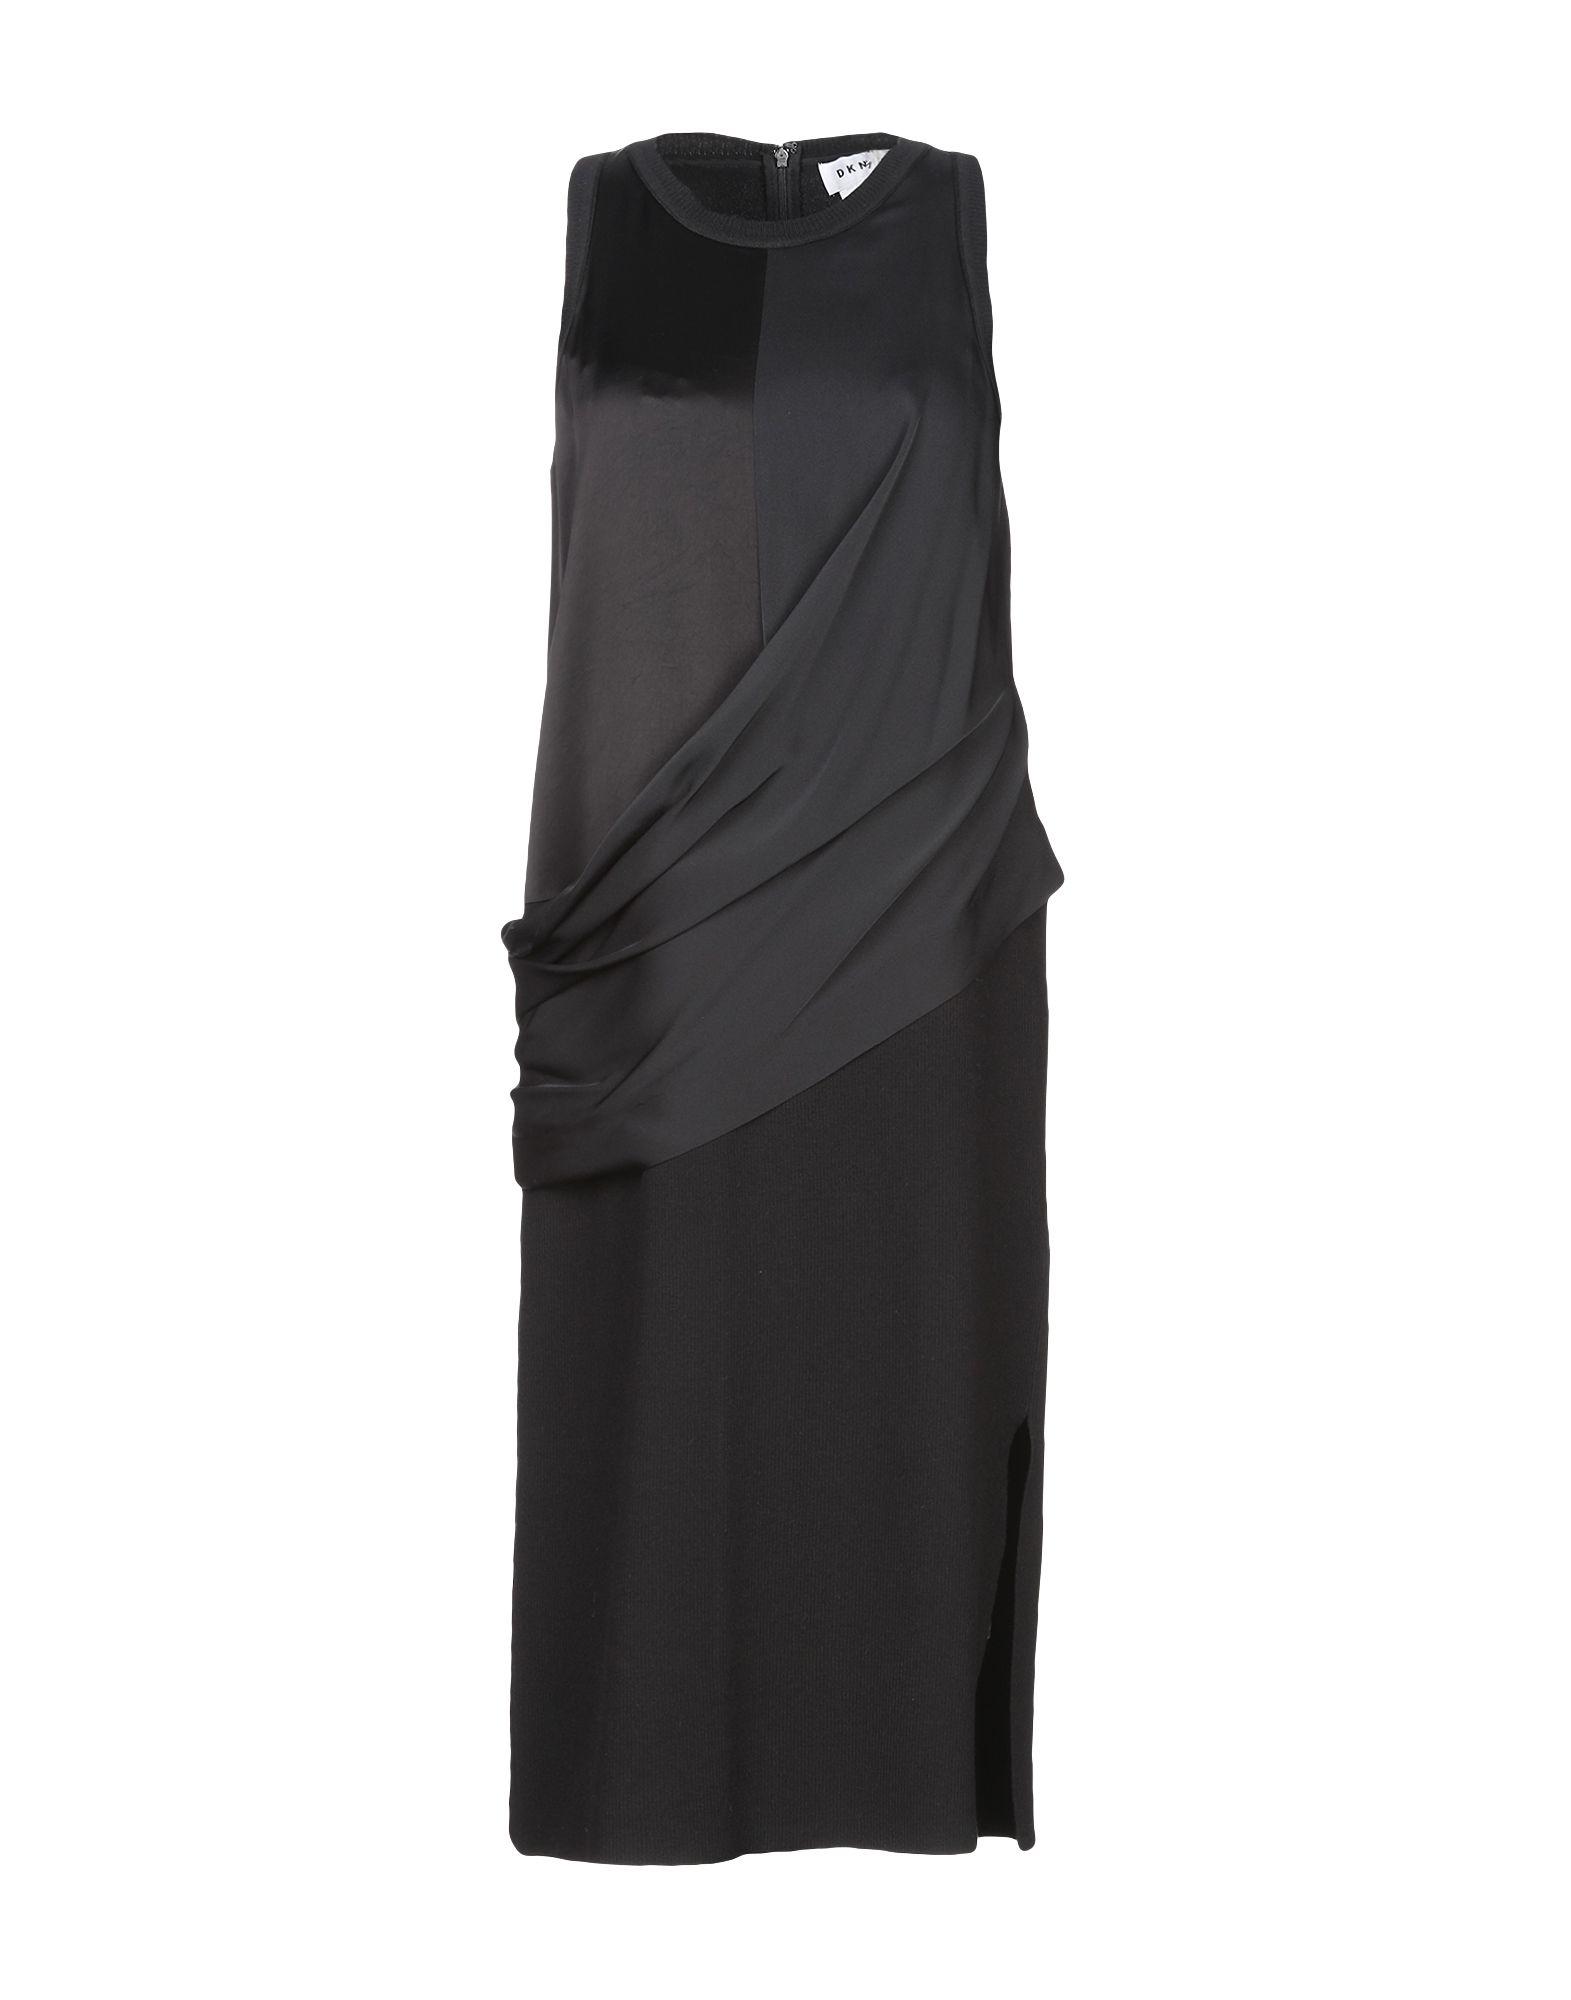 Фото - DKNY Платье до колена обувь на высокой платформе dkny